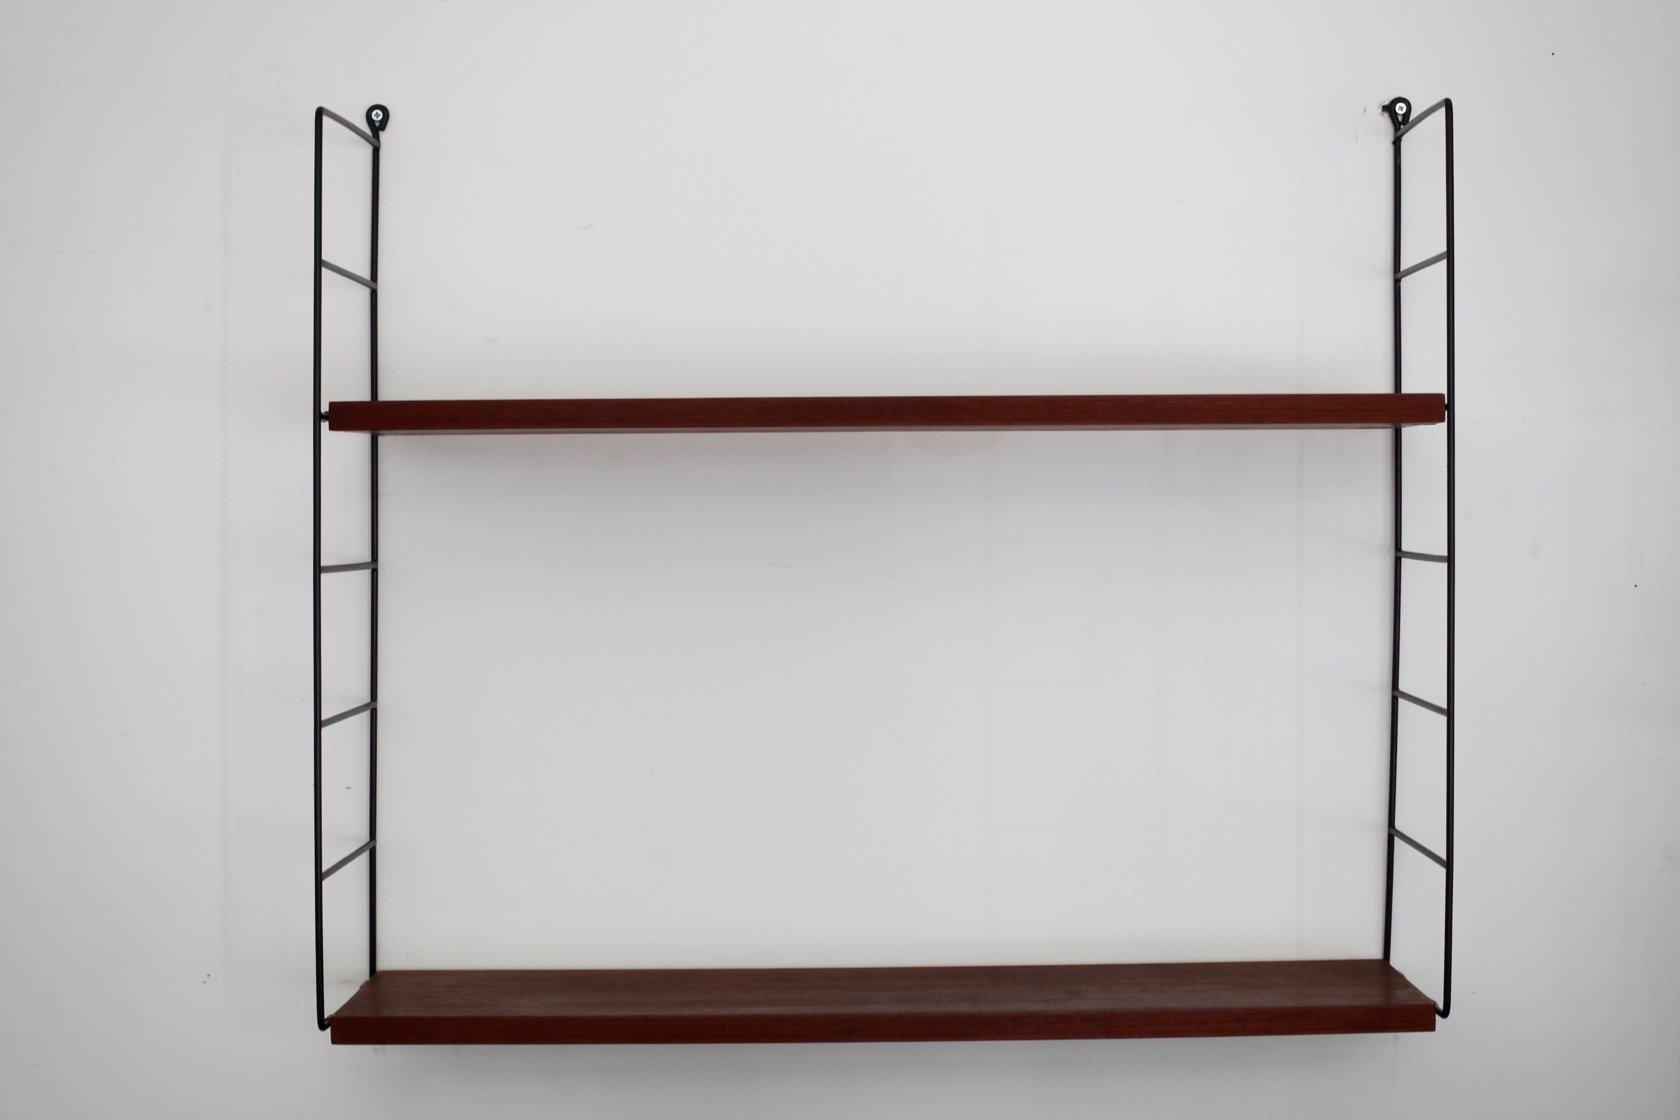 Mid Century Wall Shelf Unit By Kajsa Nils Nisse Strinning For String